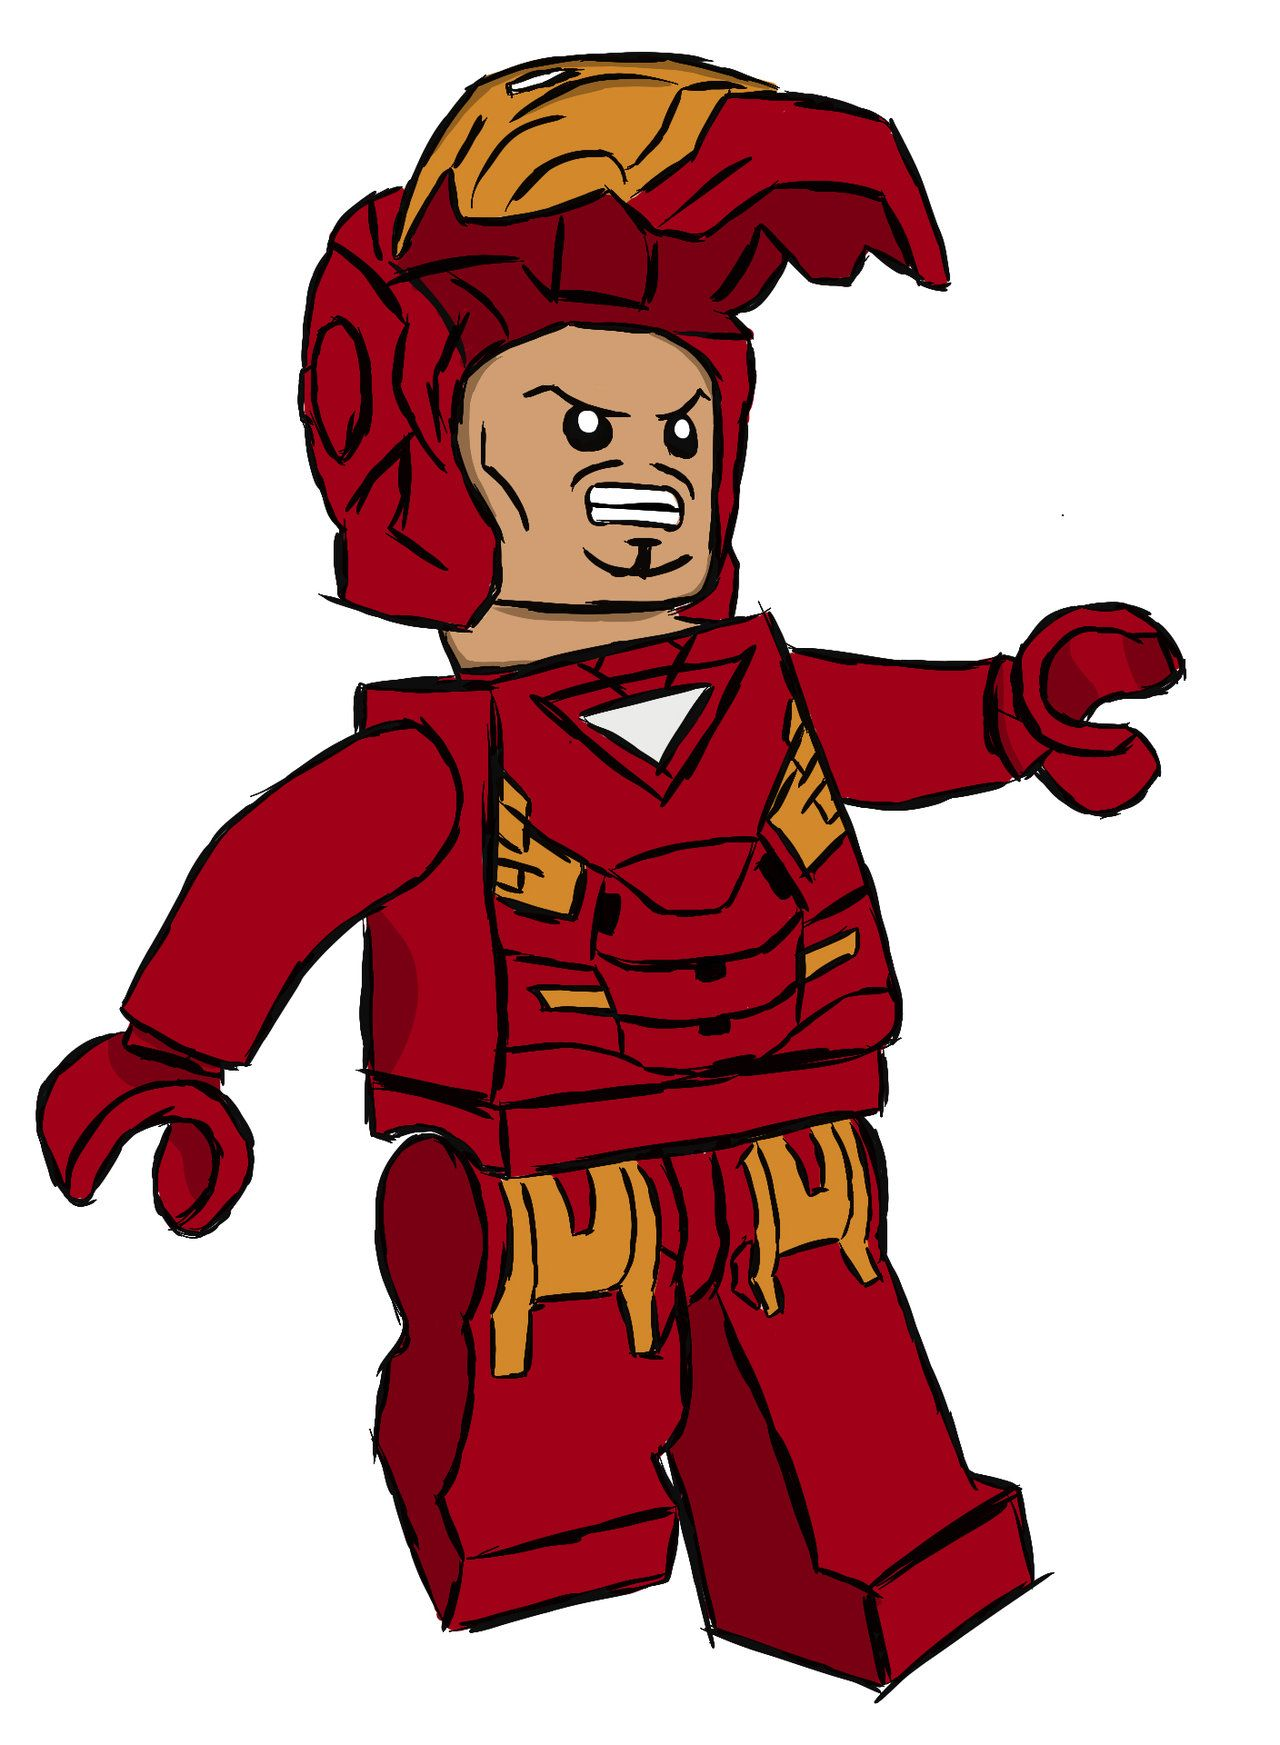 Lego Iron Man Cartoon - Lego Iron Man Digital Drawing